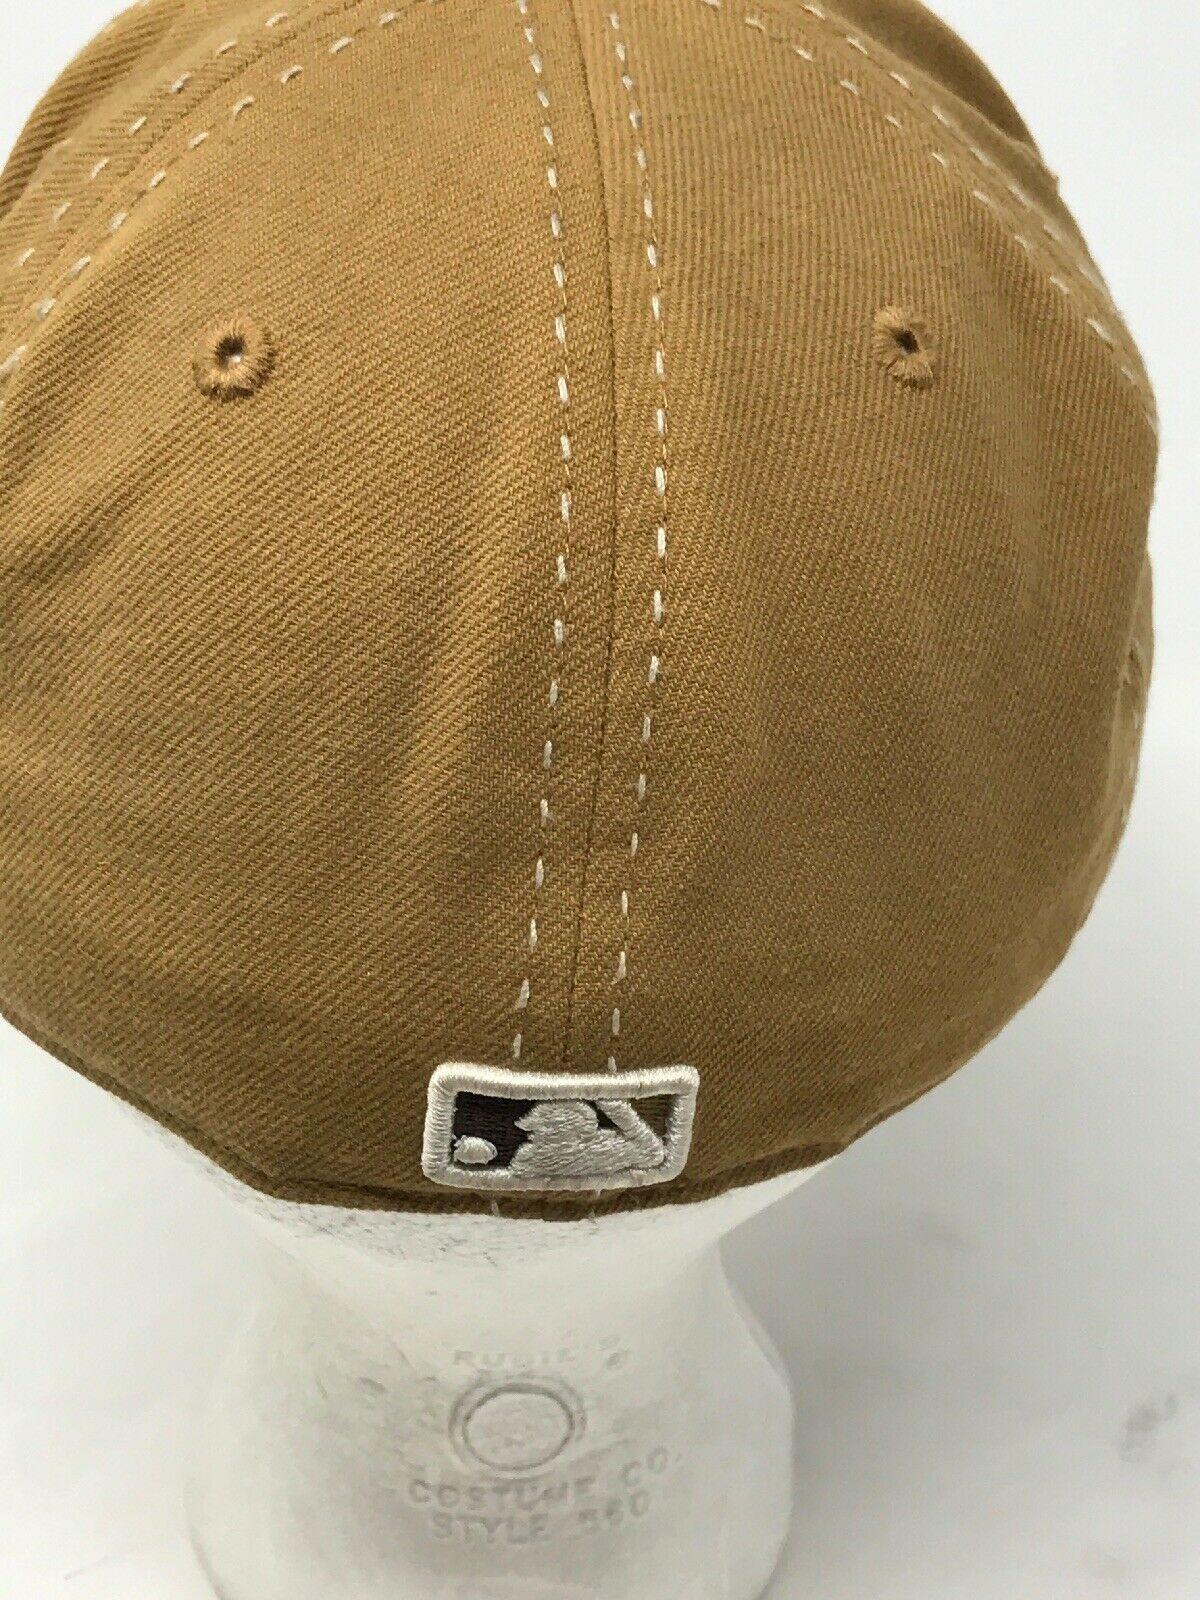 Tan Los Angeles Dodgers Desert Brown 7sz Fitted Baseball Hat New Era 59Fifty Cap